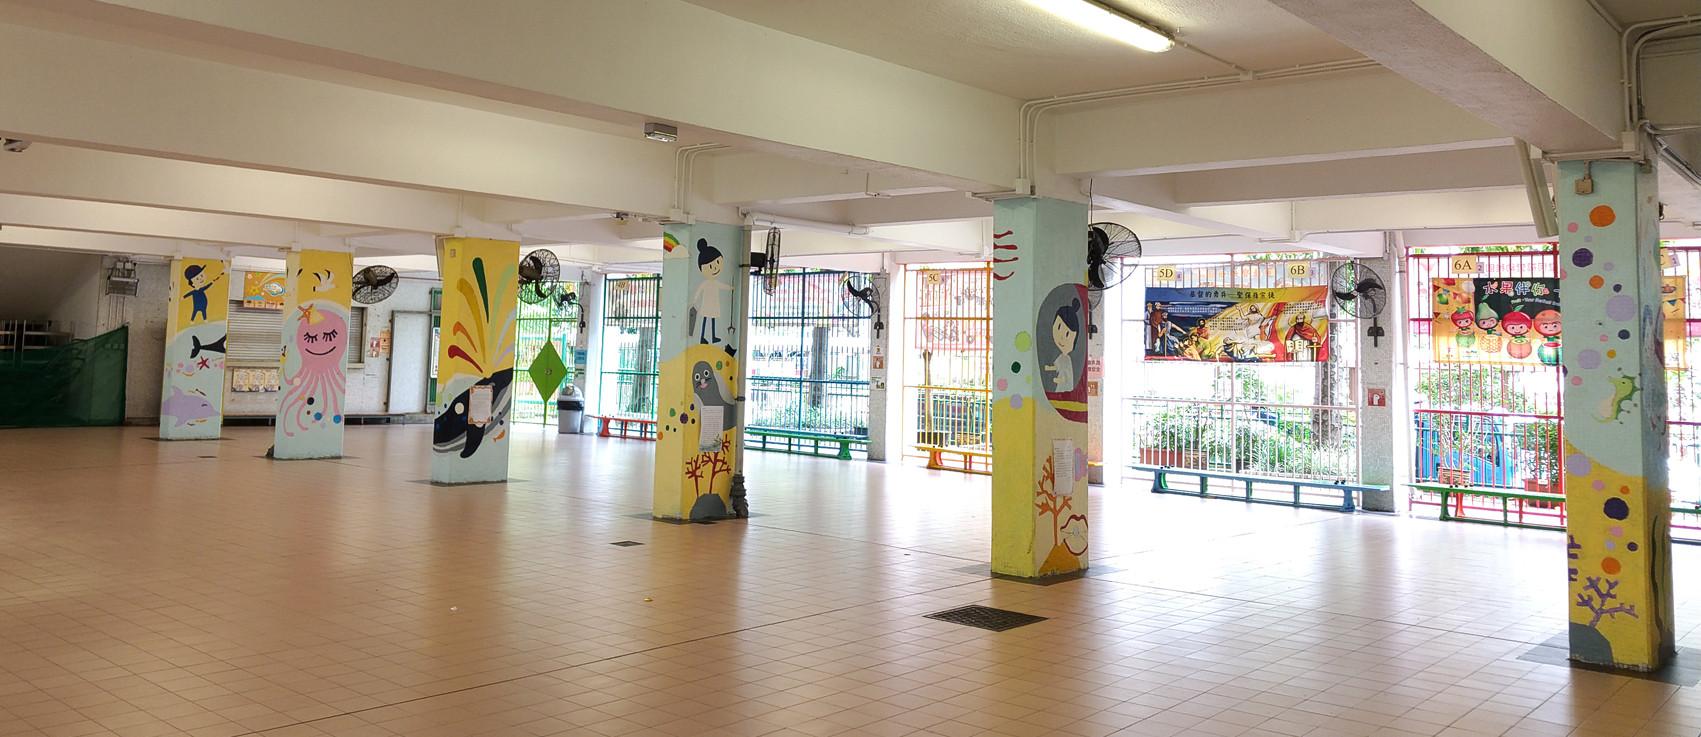 #CSR #企業社會責任#Team Building #義工活動 #Art Jam#社區藝術 #校園服務  #壁畫創作 #空間營造 #校舍翻新#視藝教育#體驗學習 #兒童參與#社群發展  企業/學校/非牟利機構顧問項目詳情:www.communitybuilders.hk